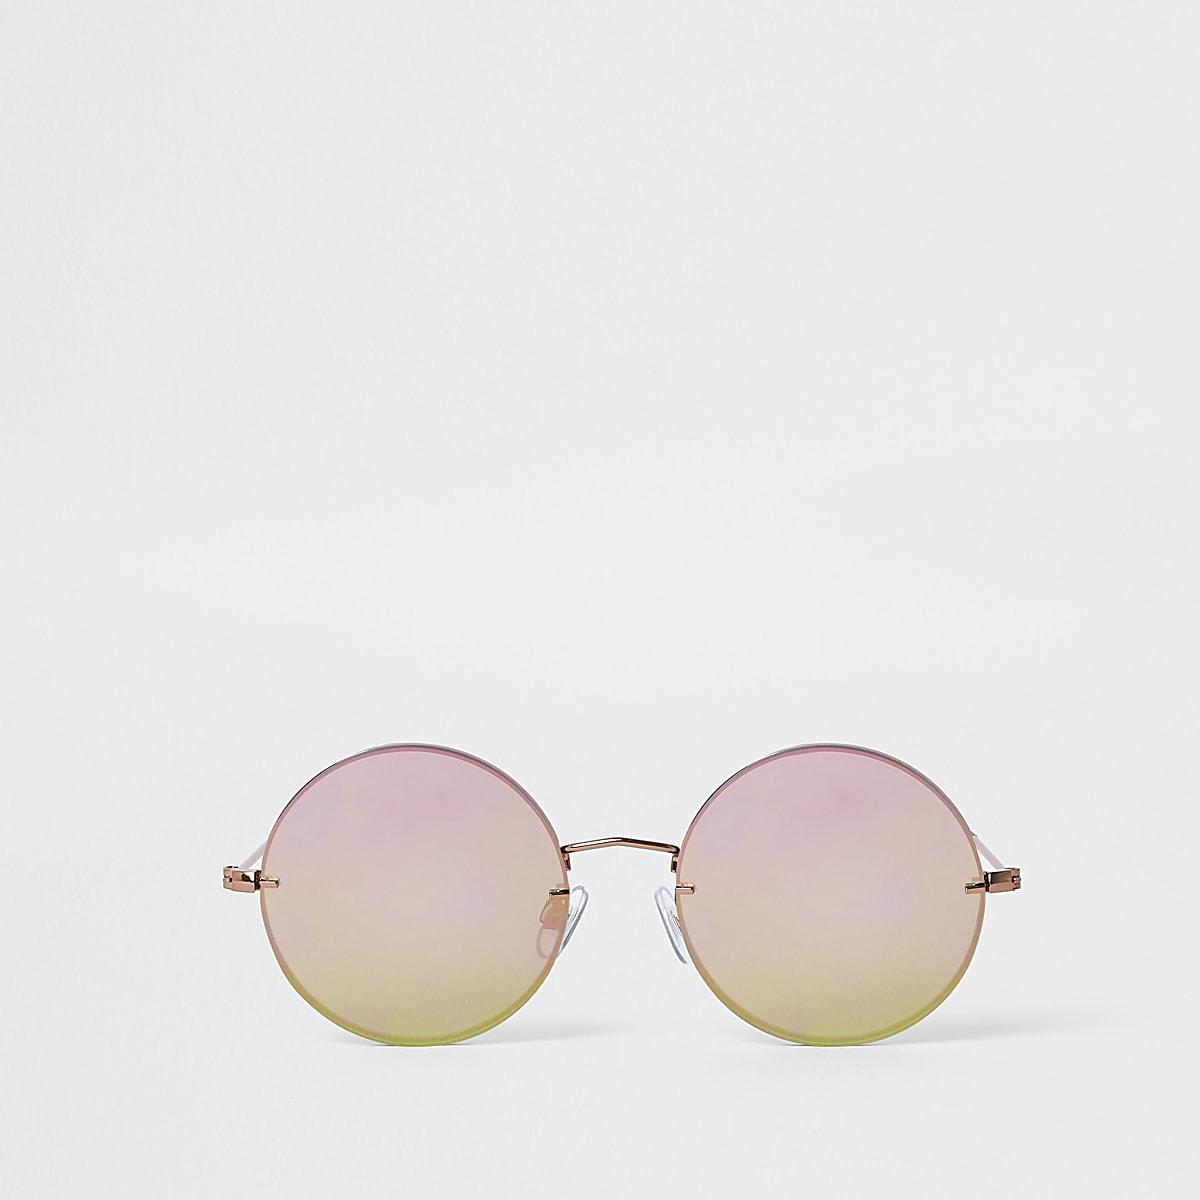 Zonnebril Met Ronde Glazen.Grey Round Retro Revo Lens Sunglasses